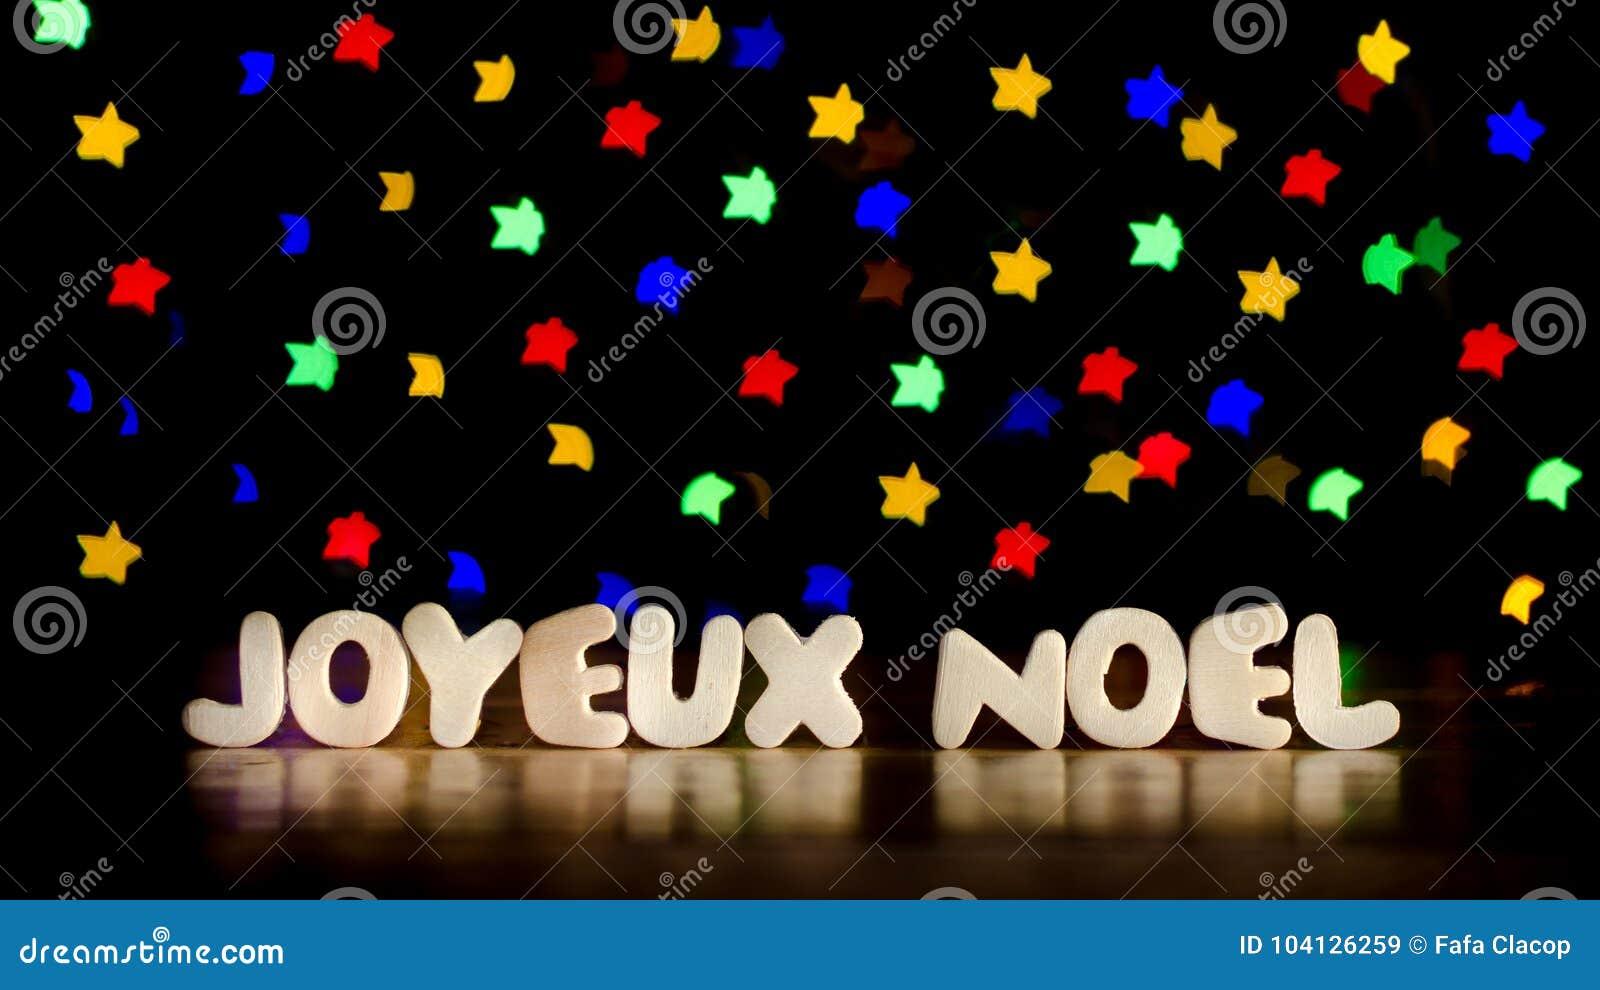 Joyeux Noel, Χαρούμενα Χριστούγεννα στη γαλλική γλώσσα